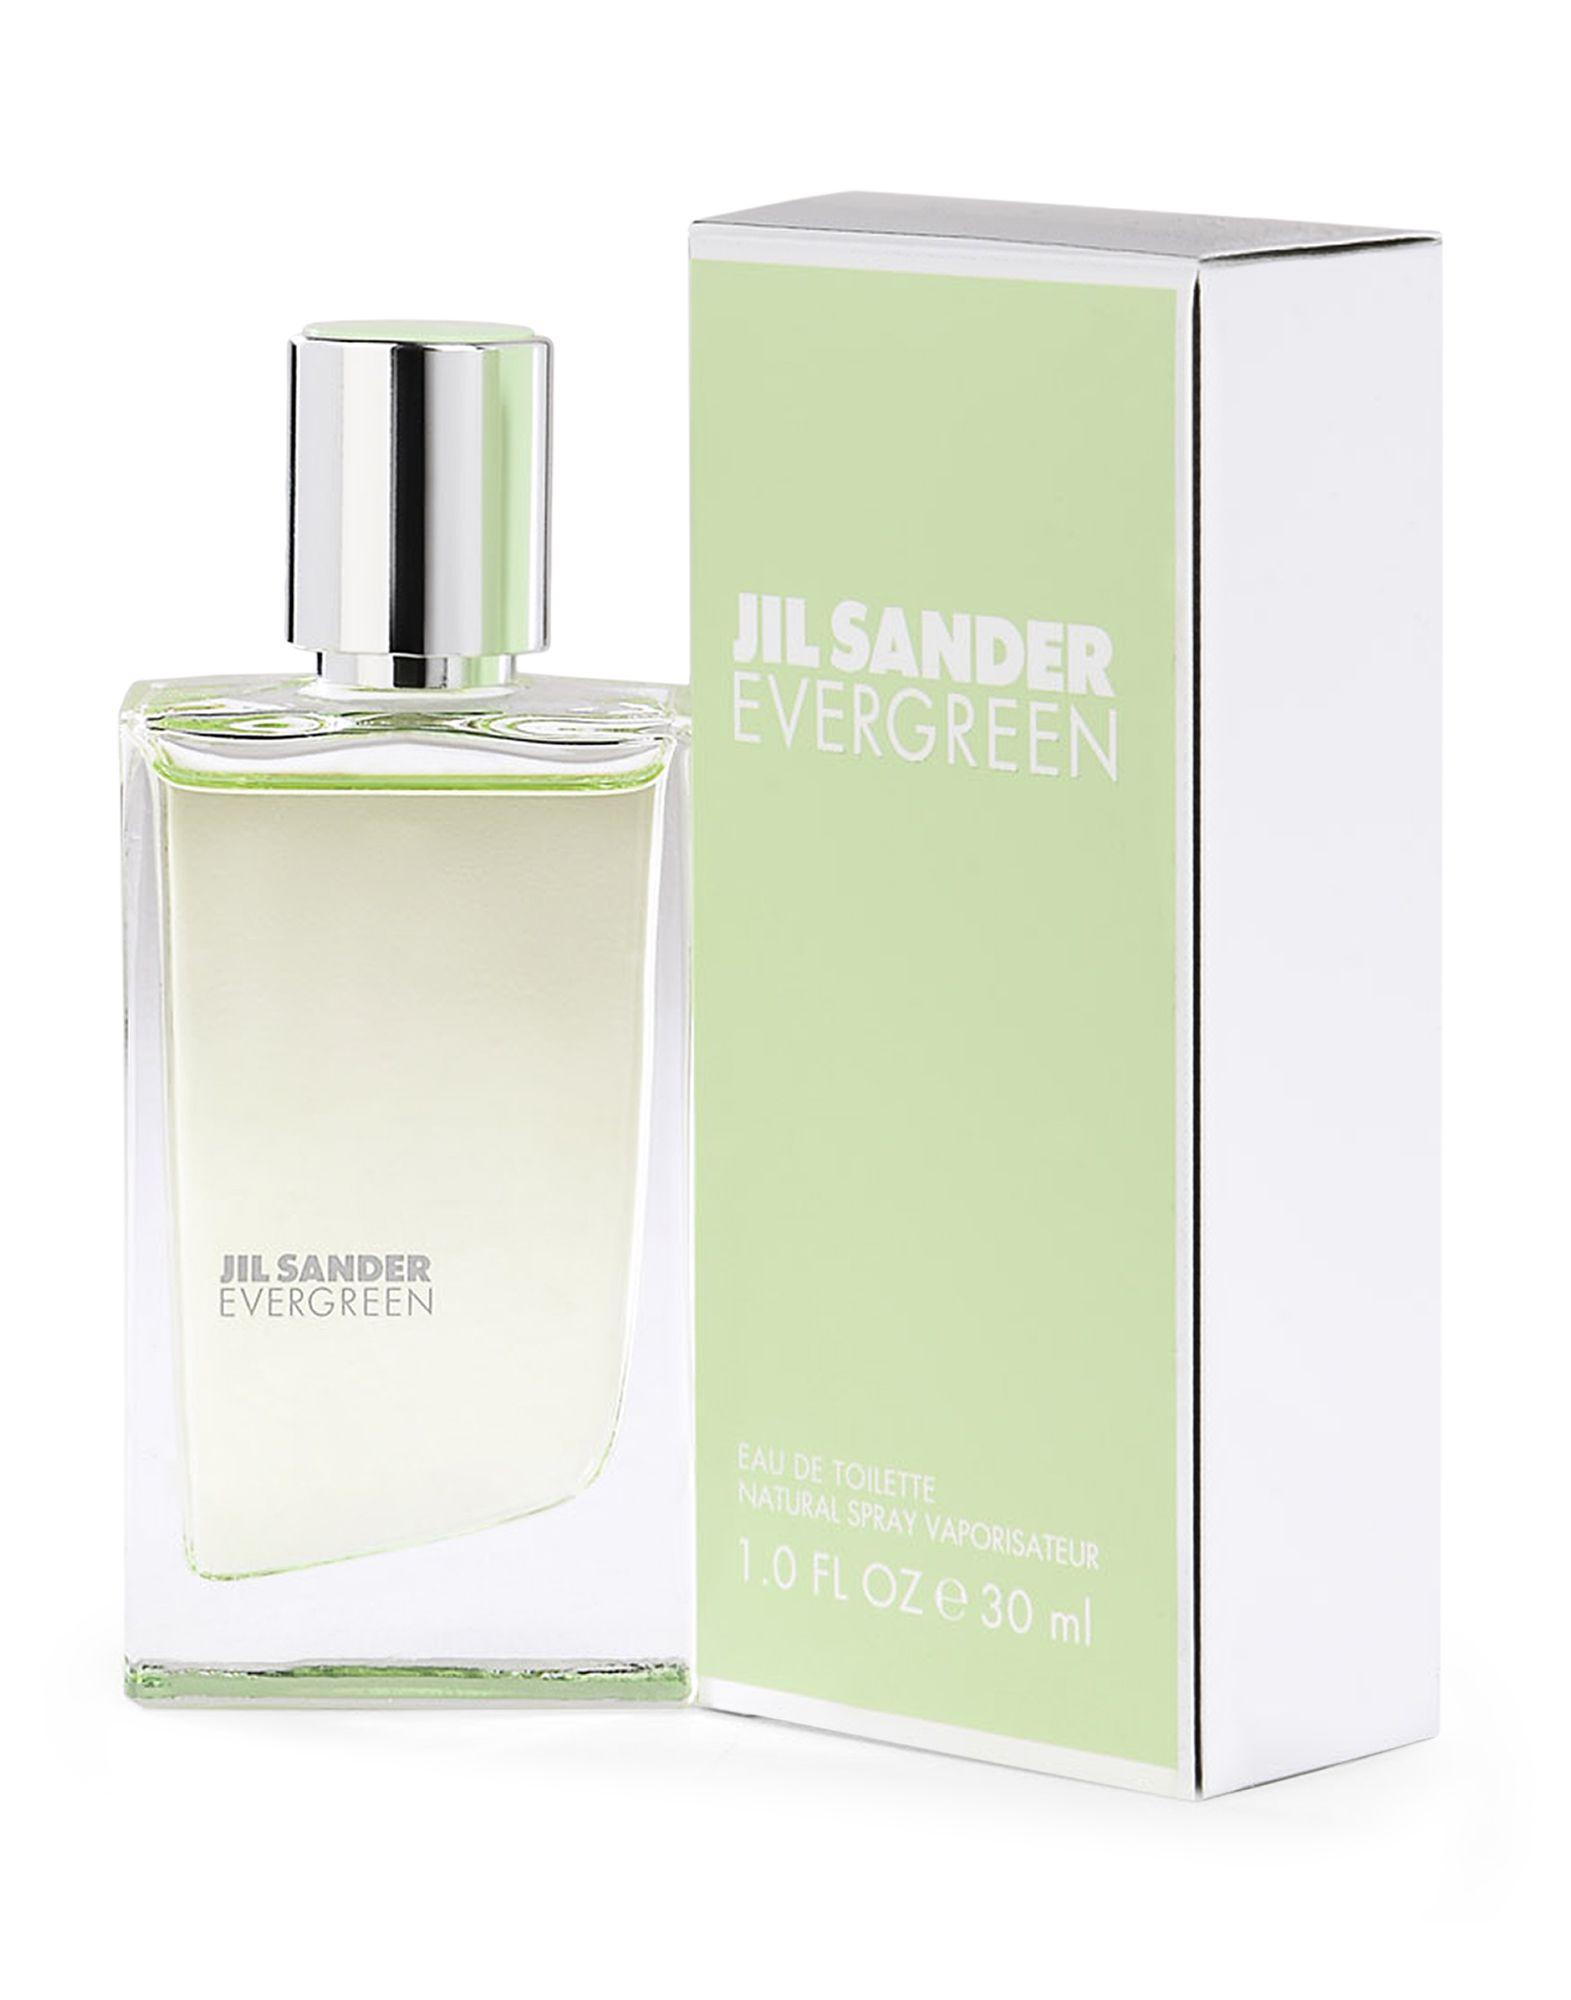 Evergreen - JIL SANDER Online Store